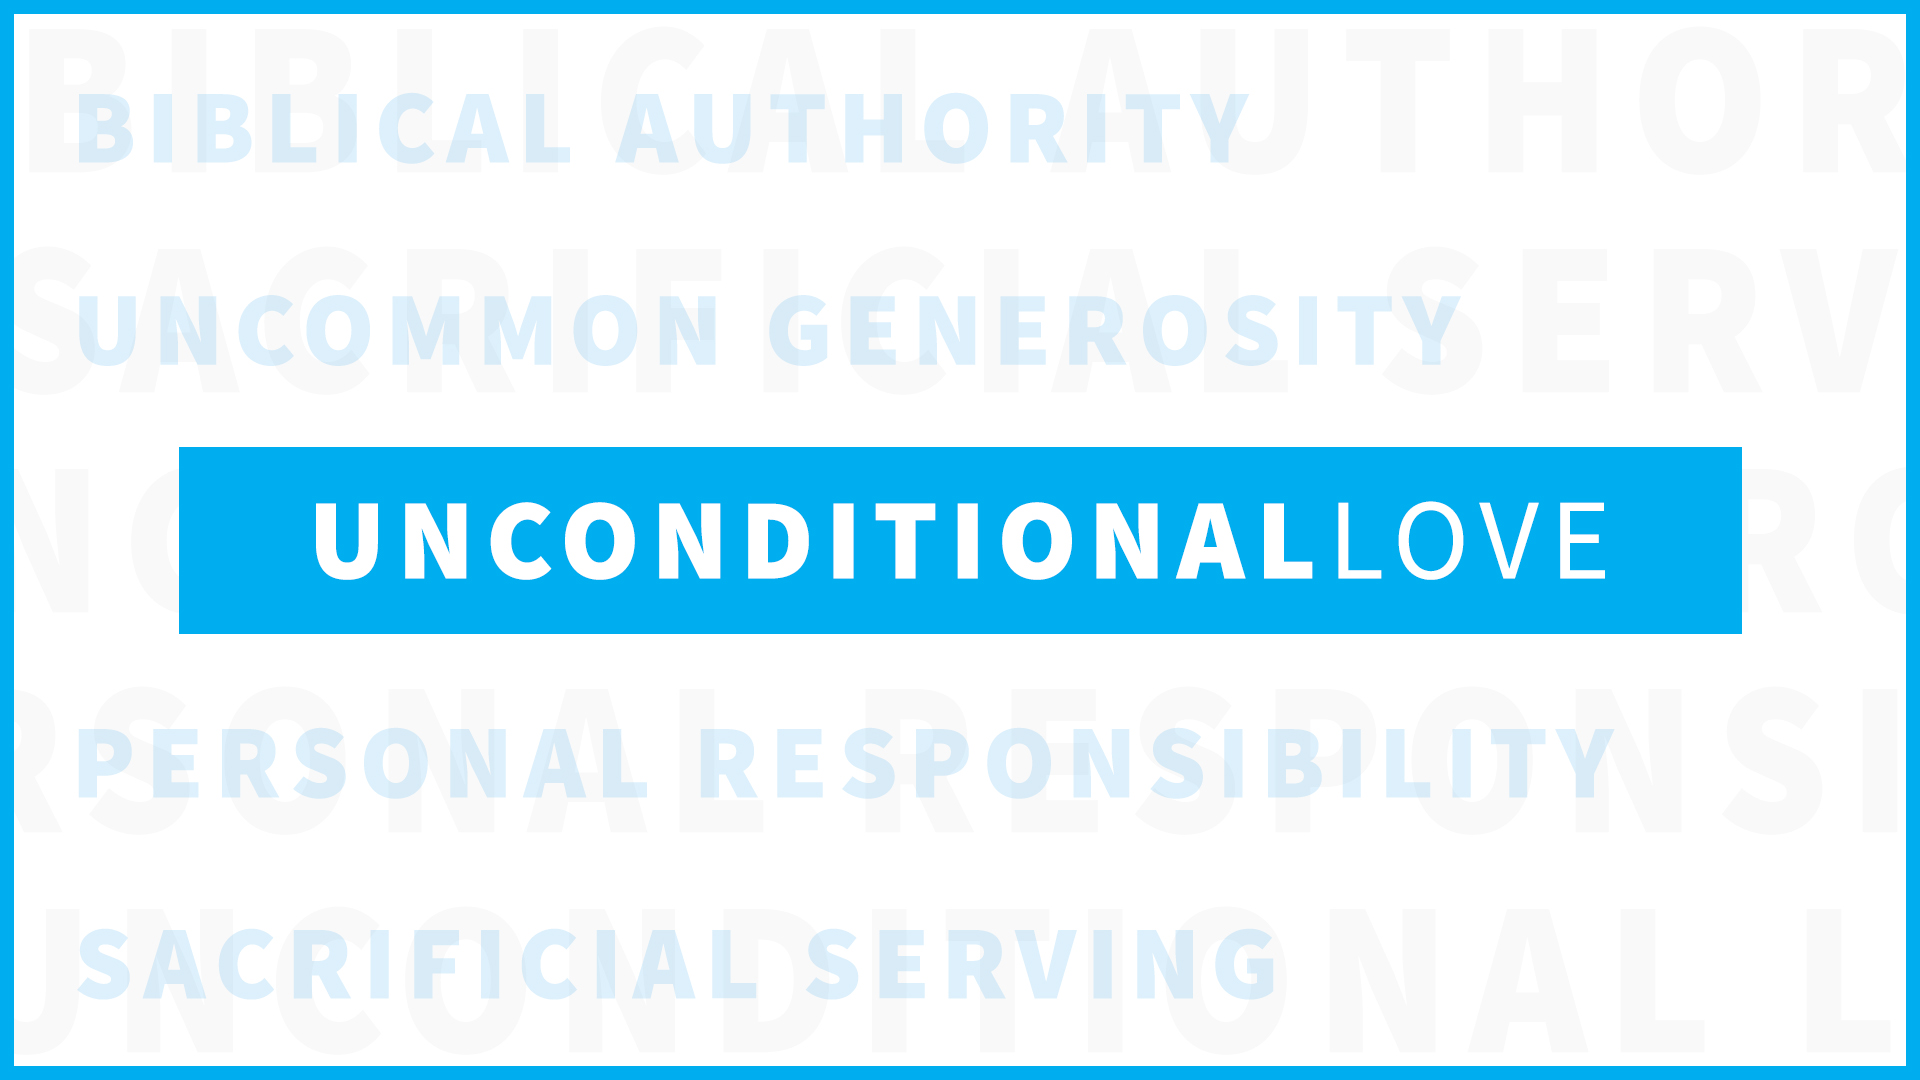 Unconditional Love_Alt_1920x1080.jpg